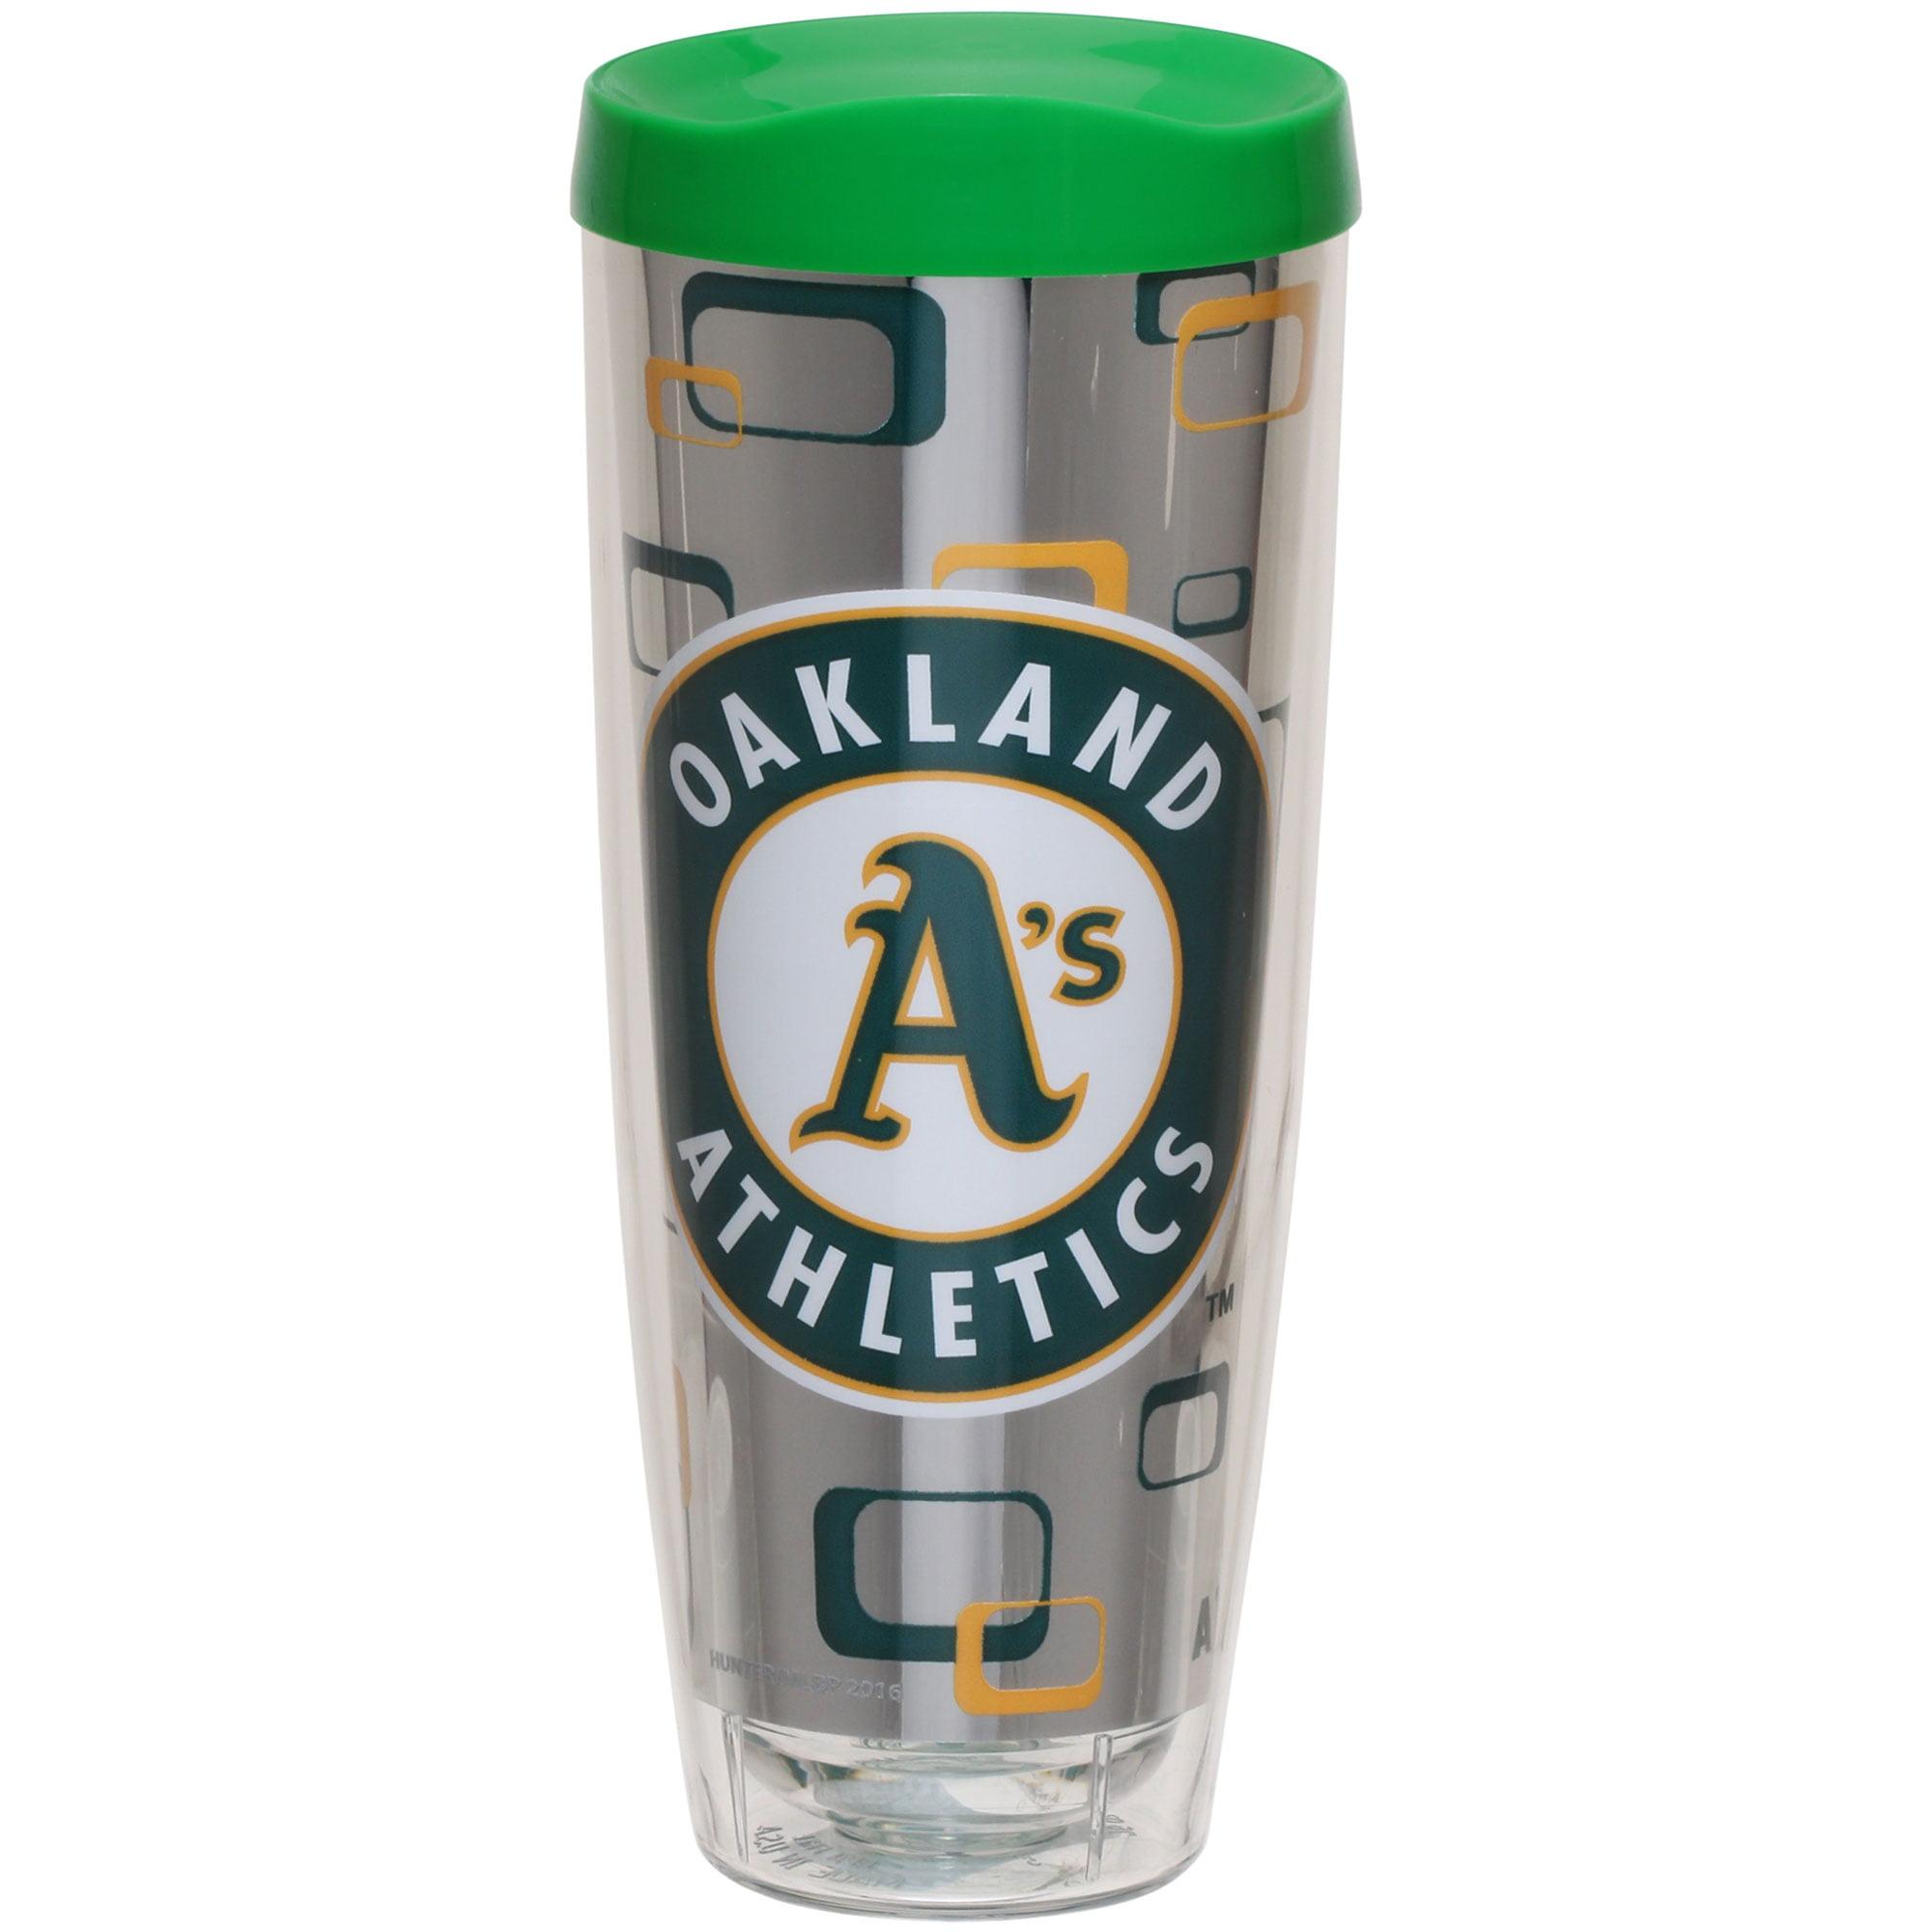 Oakland Athletics 26oz. Tritan Foil Wrap Tumbler - No Size